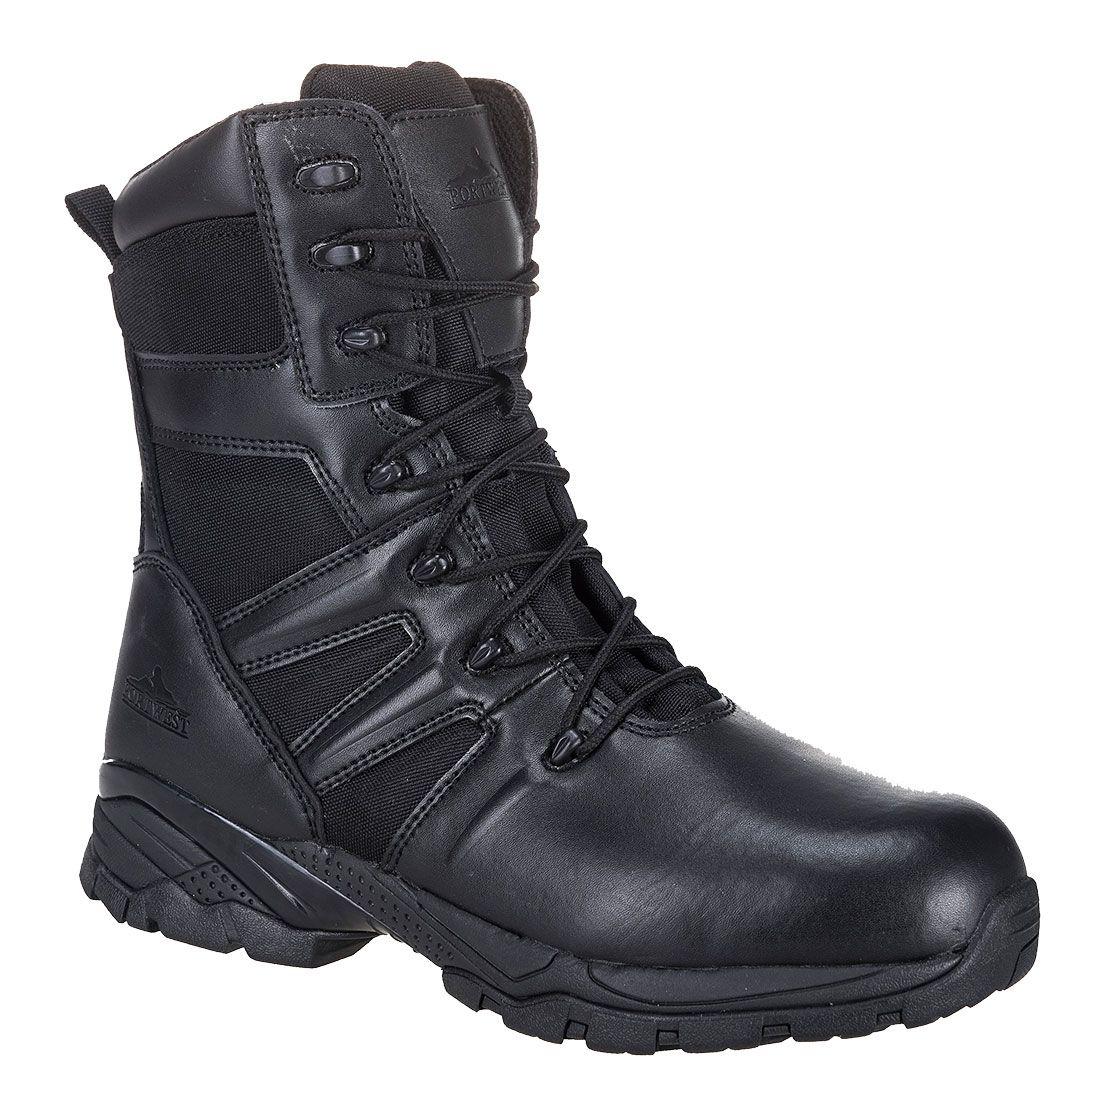 Portwest Schoenen FW65 zwart(BK)